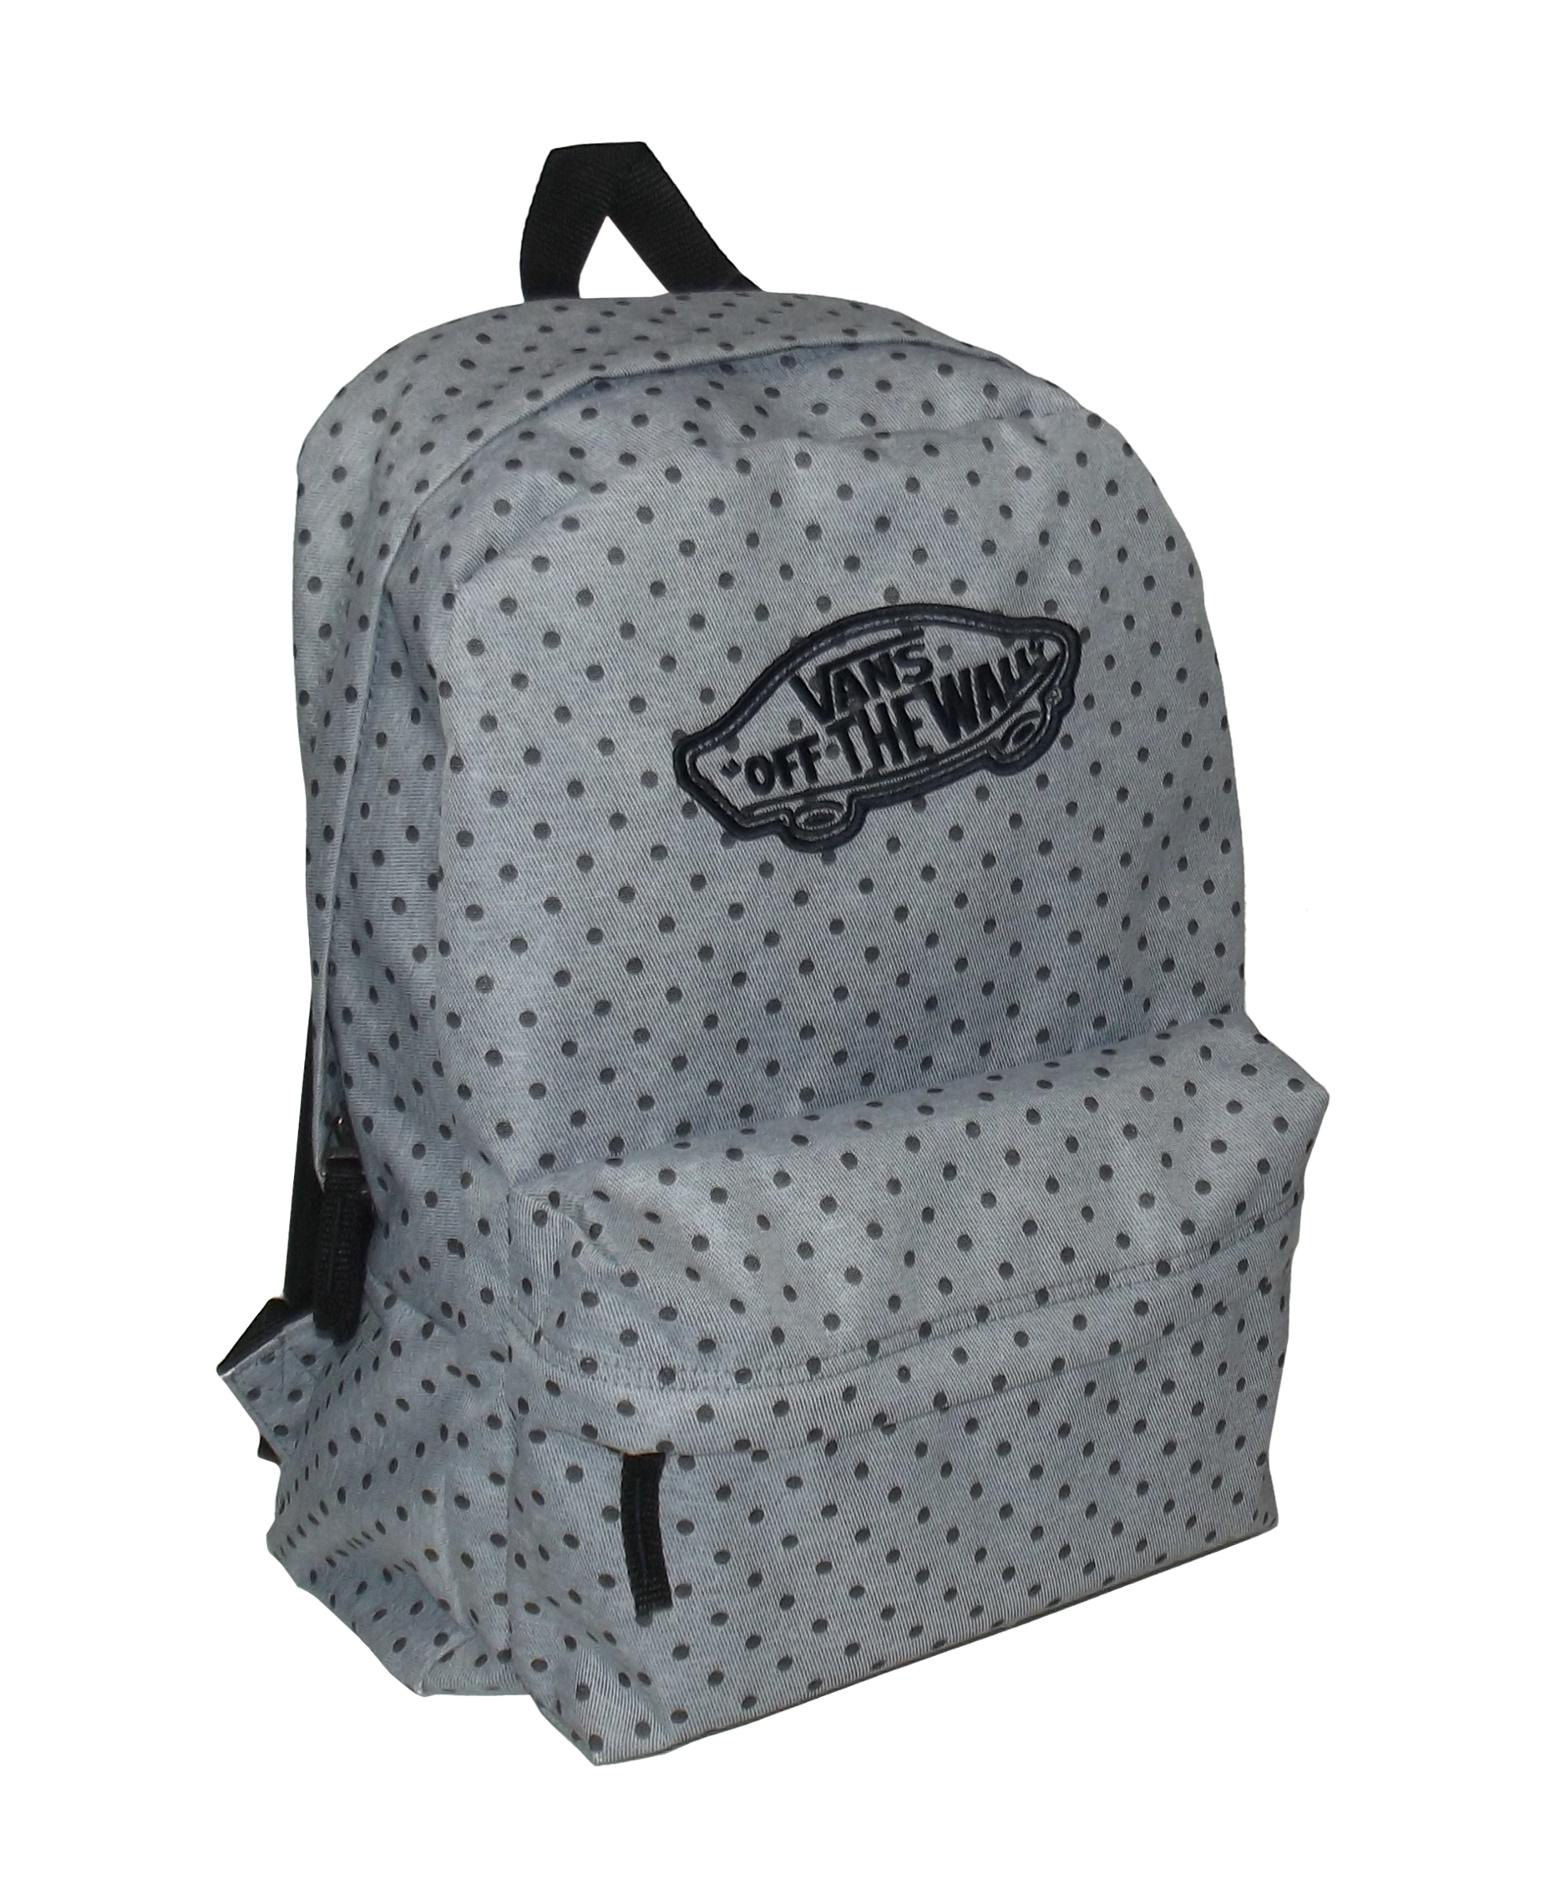 6ad83fa6bee13 plecaki vans szare allegro|Darmowa dostawa!